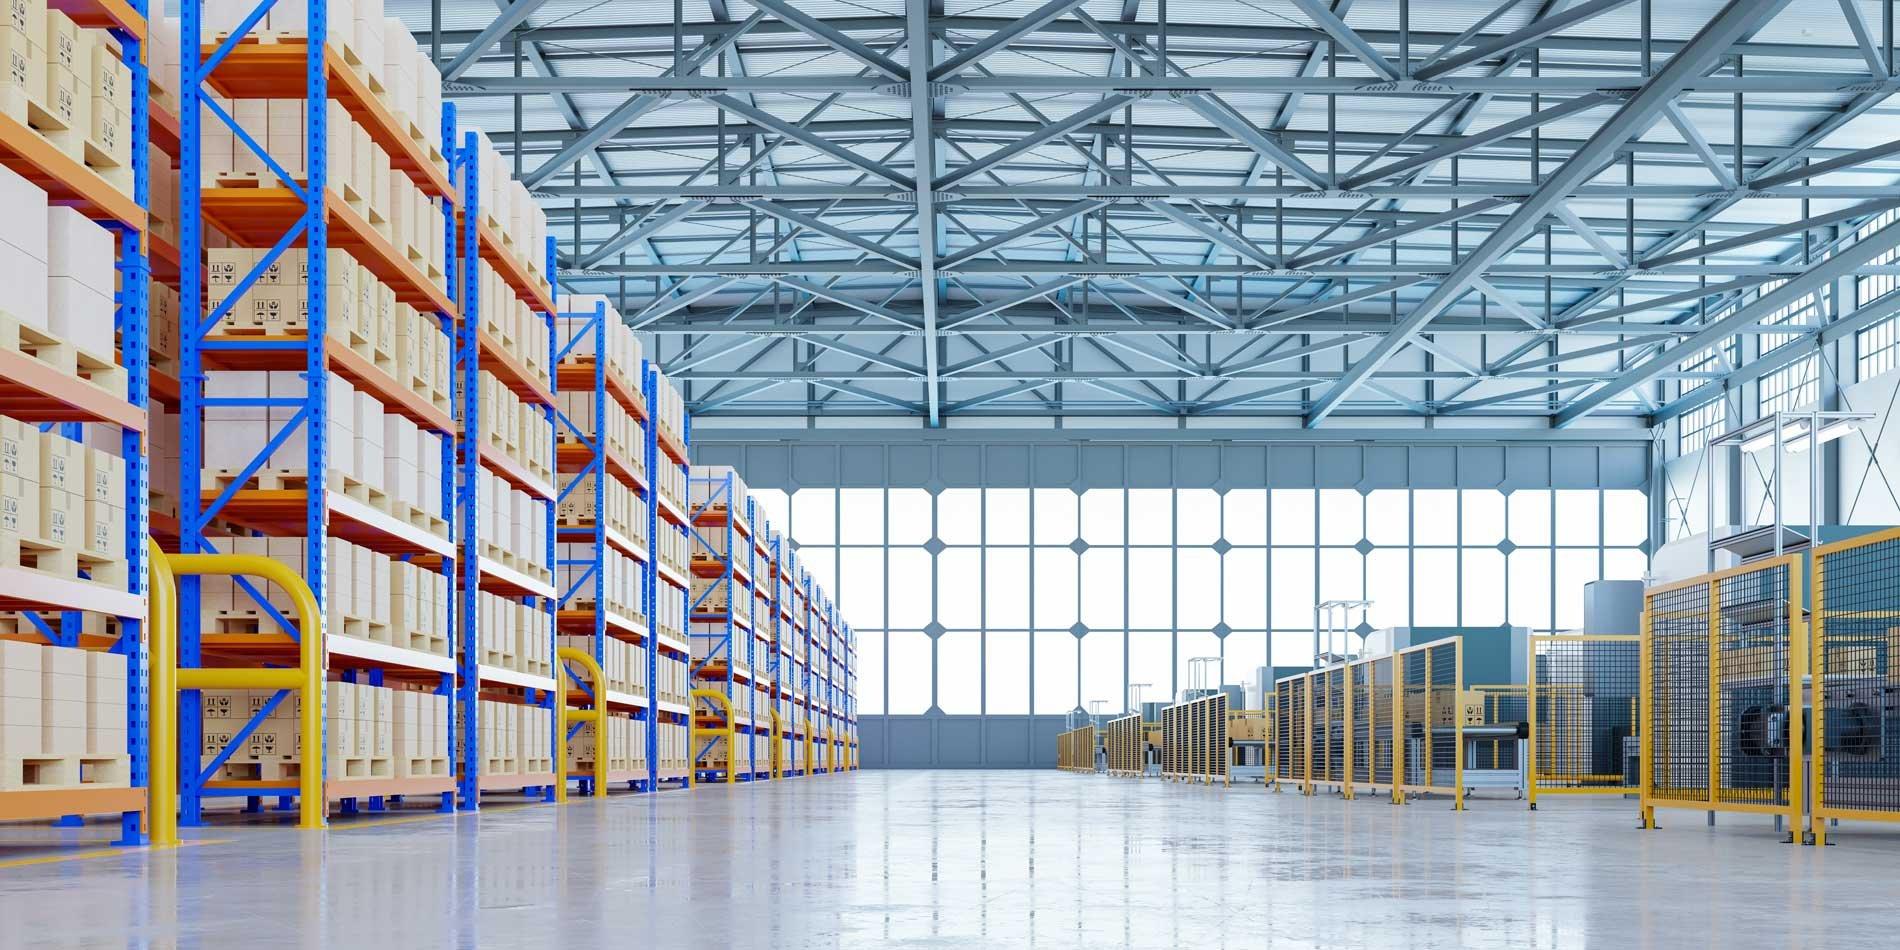 interior-of-warehouse